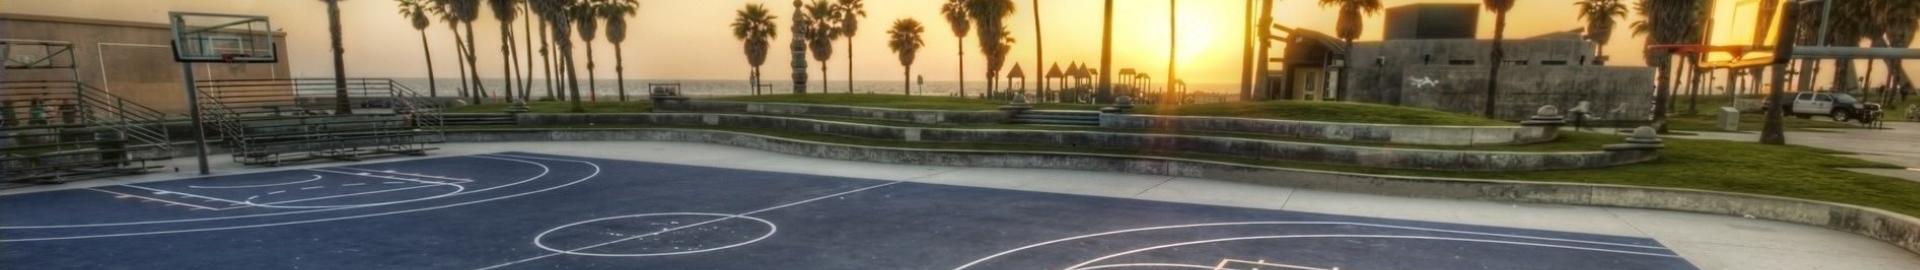 Scarpe Under Armour da Basket Uomo/Donna/Bambino   Basket Zone Siena